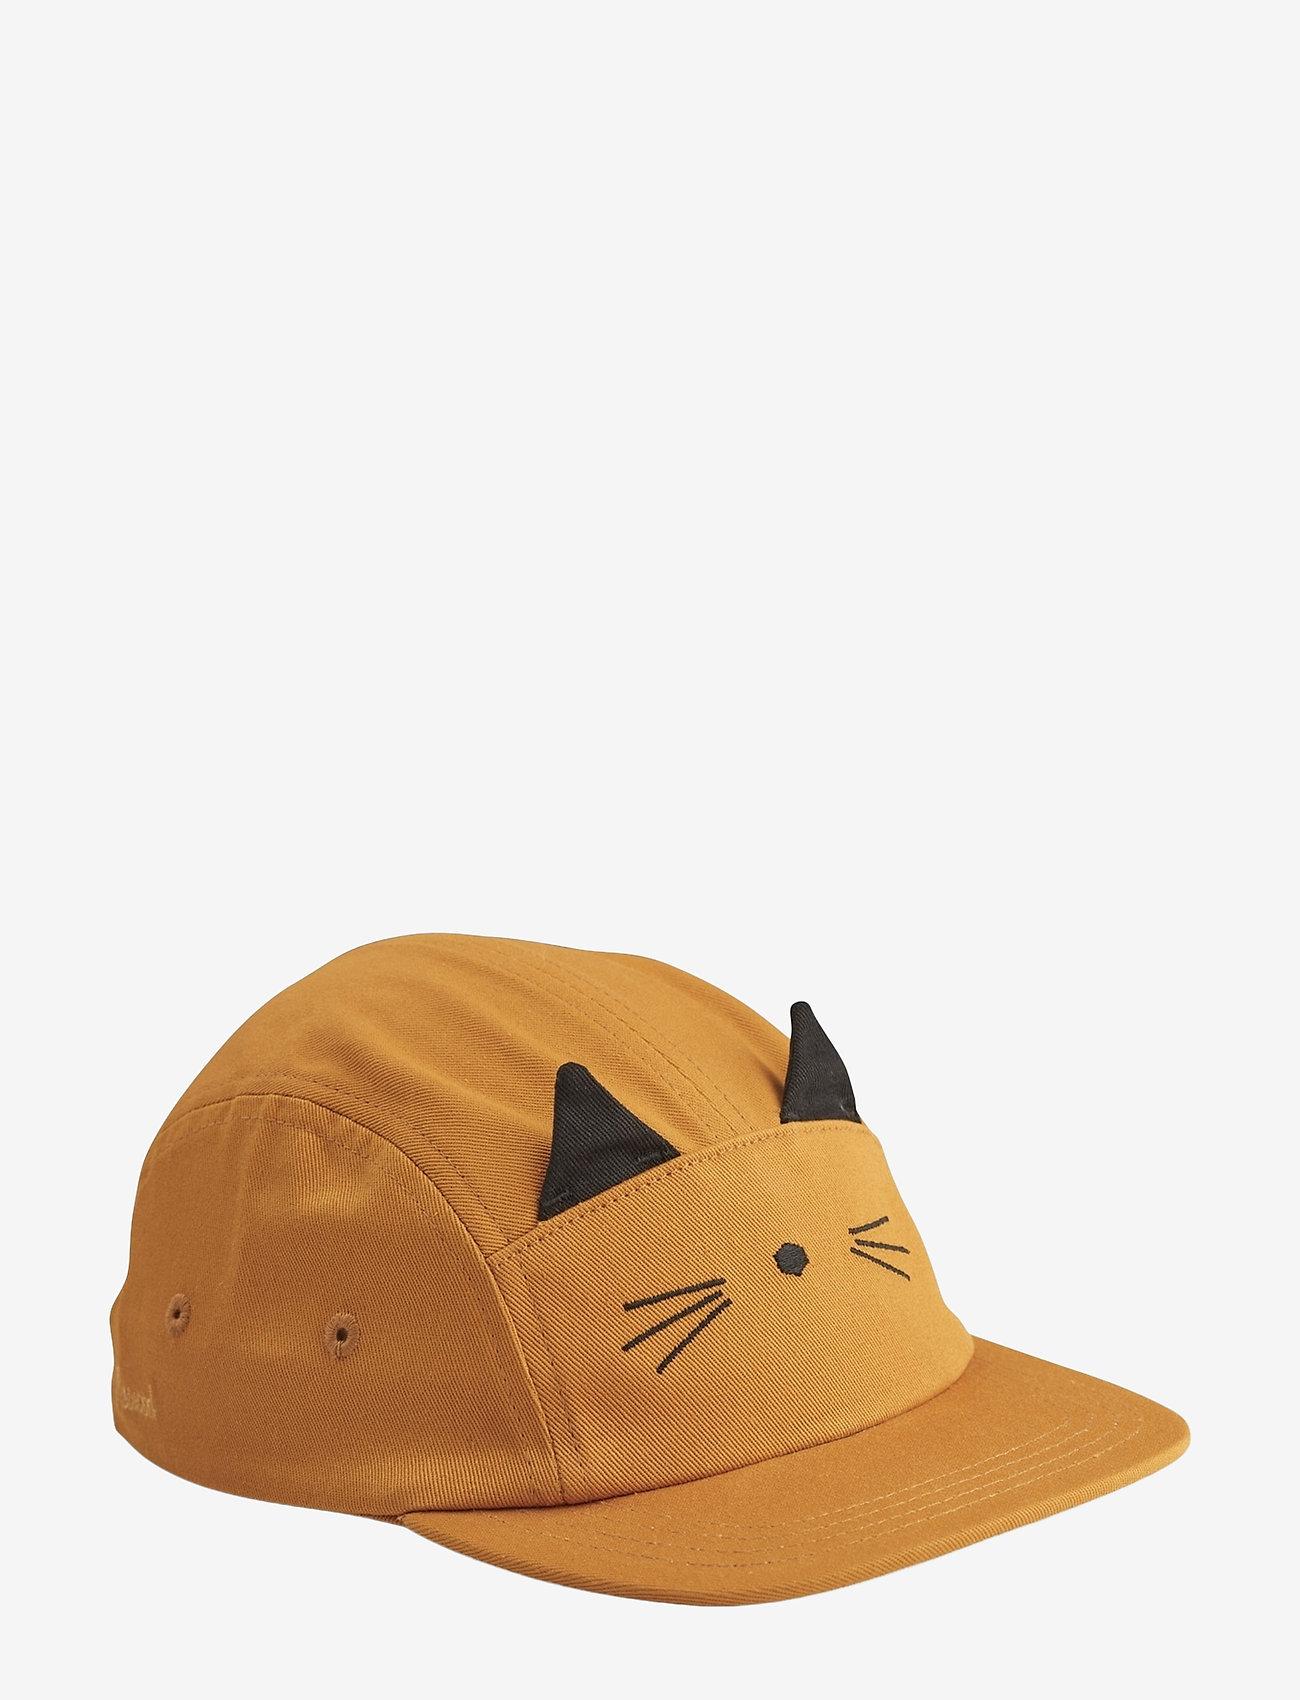 Liewood - Rory cap - mutsen - cat mustard - 0